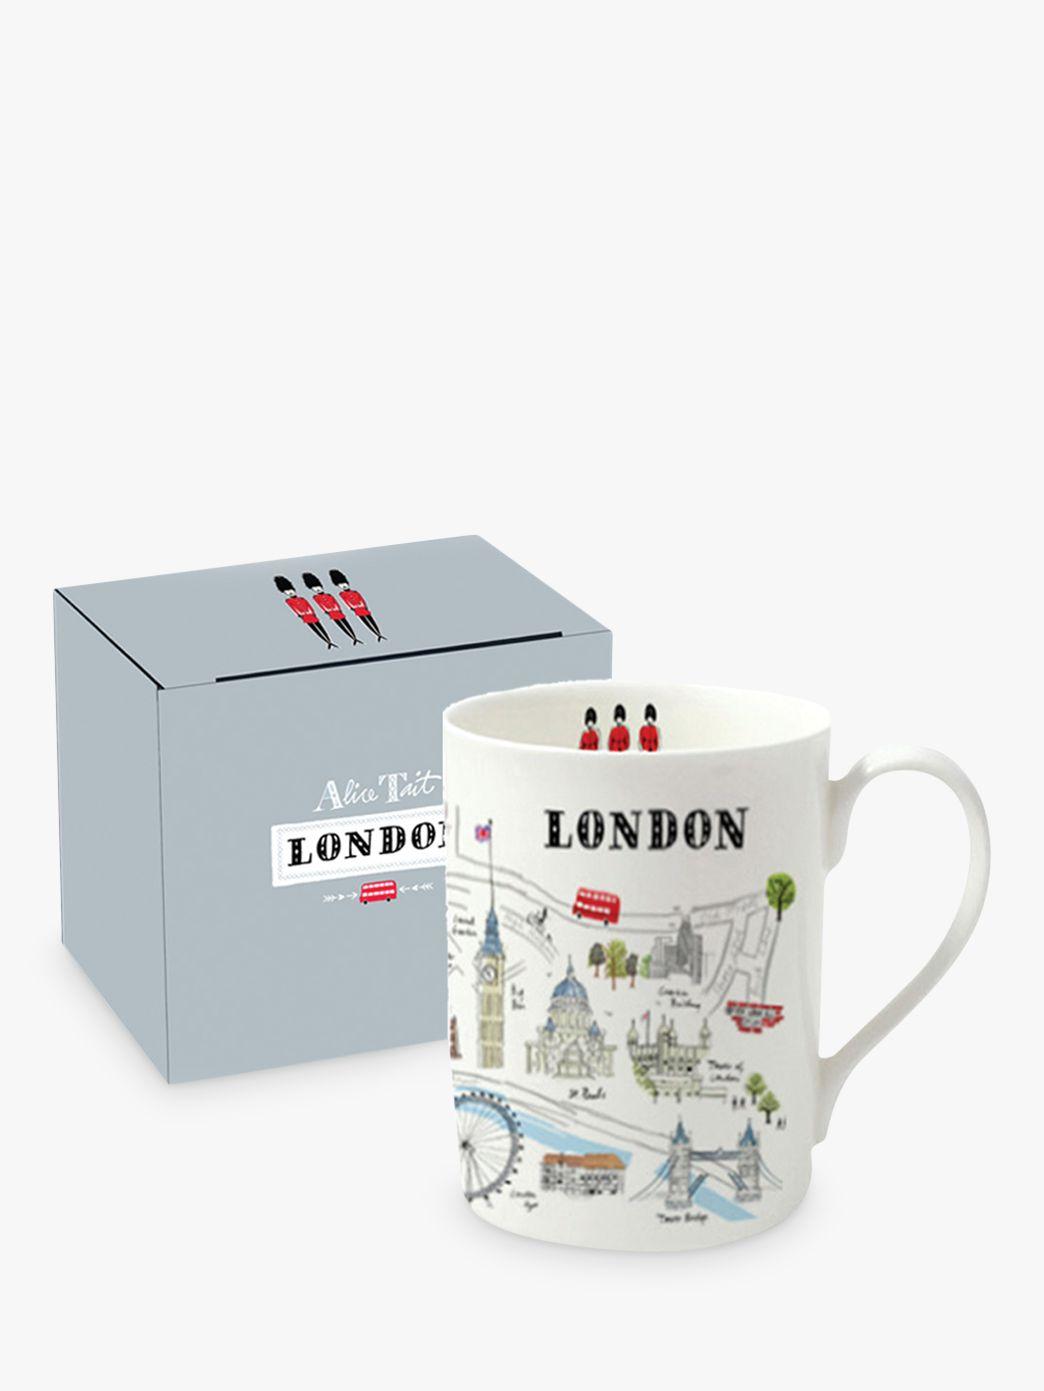 Alice Tait Alice Tait London Mug, 250ml